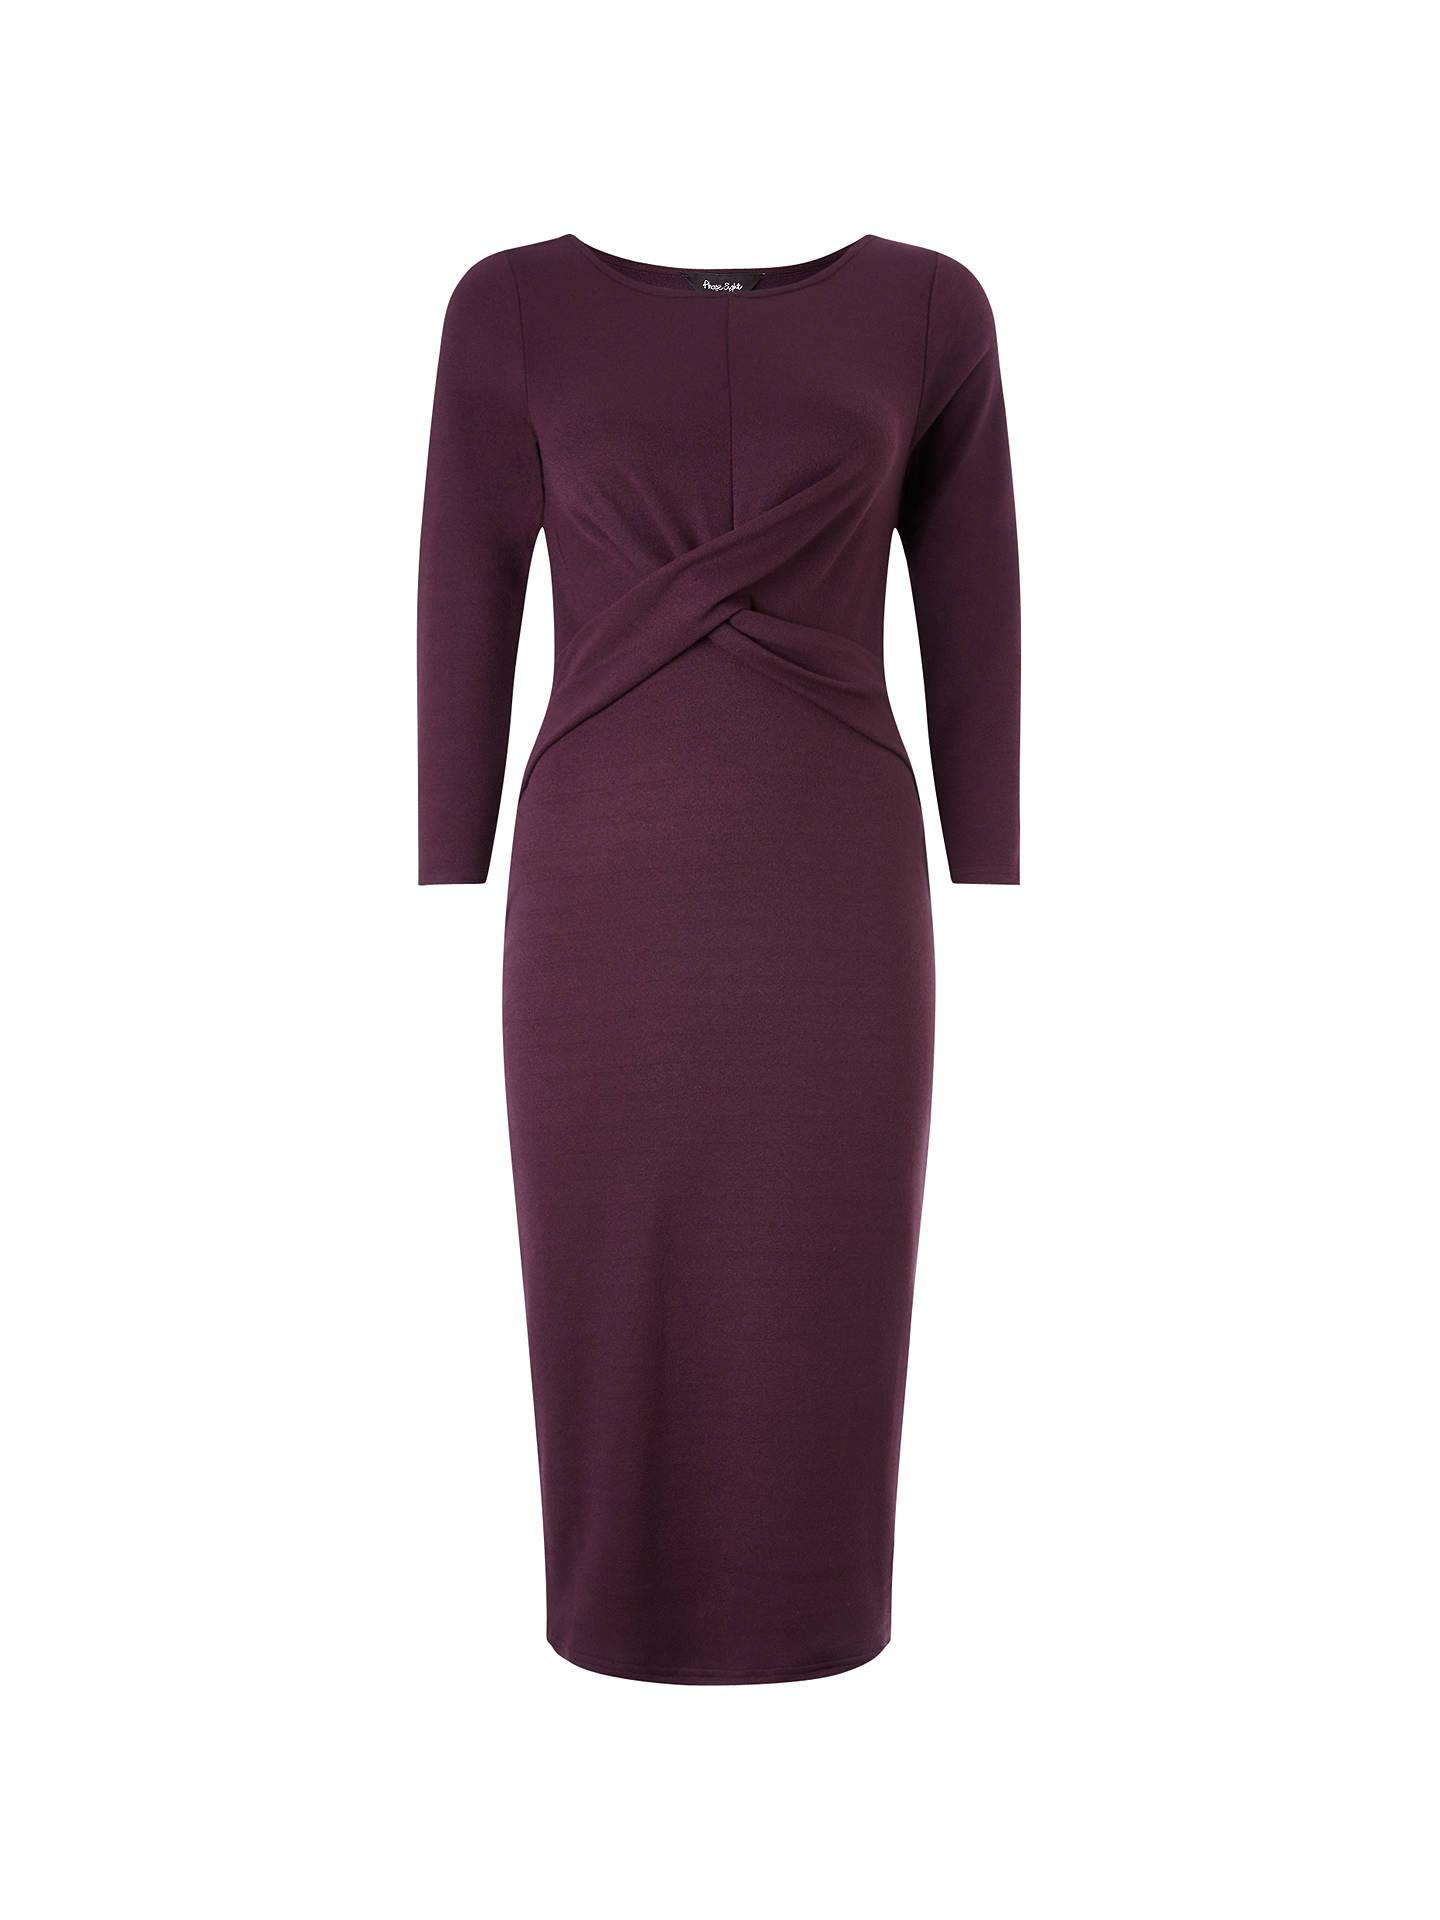 843b10960b93c Phase Eight Mandy Midi Dress, Claret at John Lewis & Partners